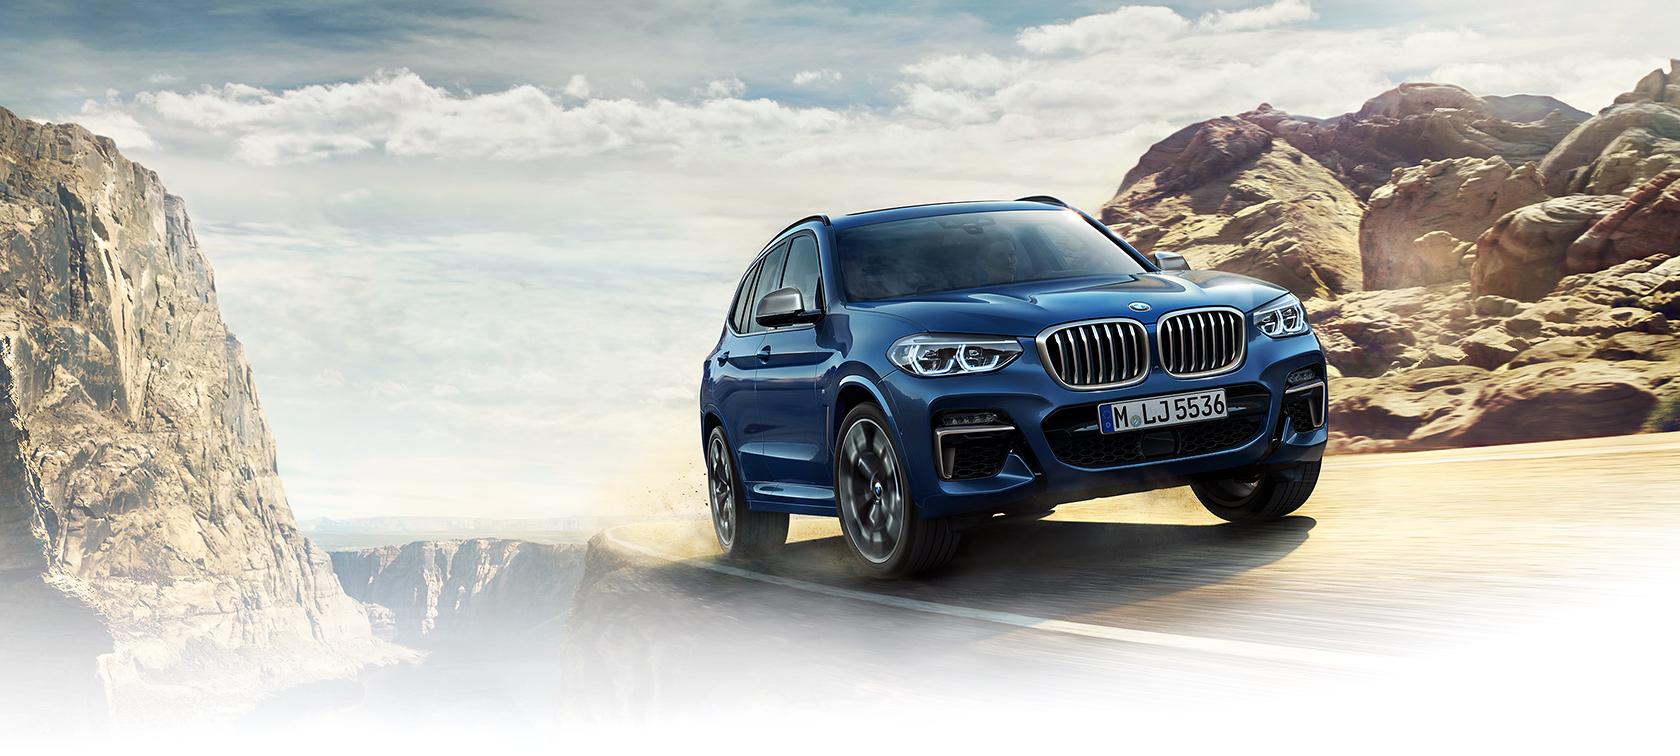 BMW X3: At a glance